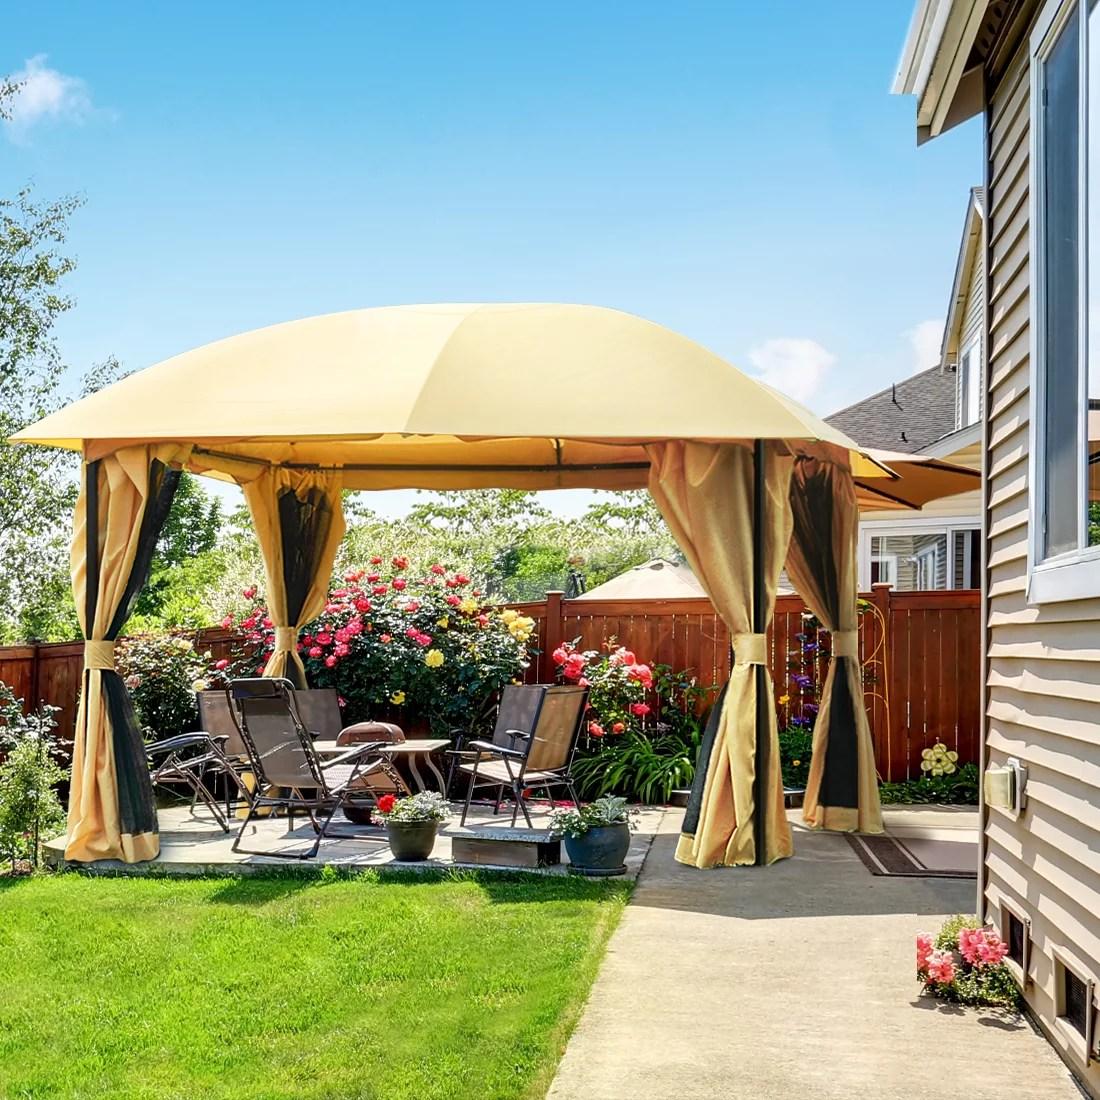 quictent 12x12 metal gazebo with mosquito netting sides screened gazebo canopy pergola for deck patio and backyard waterproof tan tan walmart com